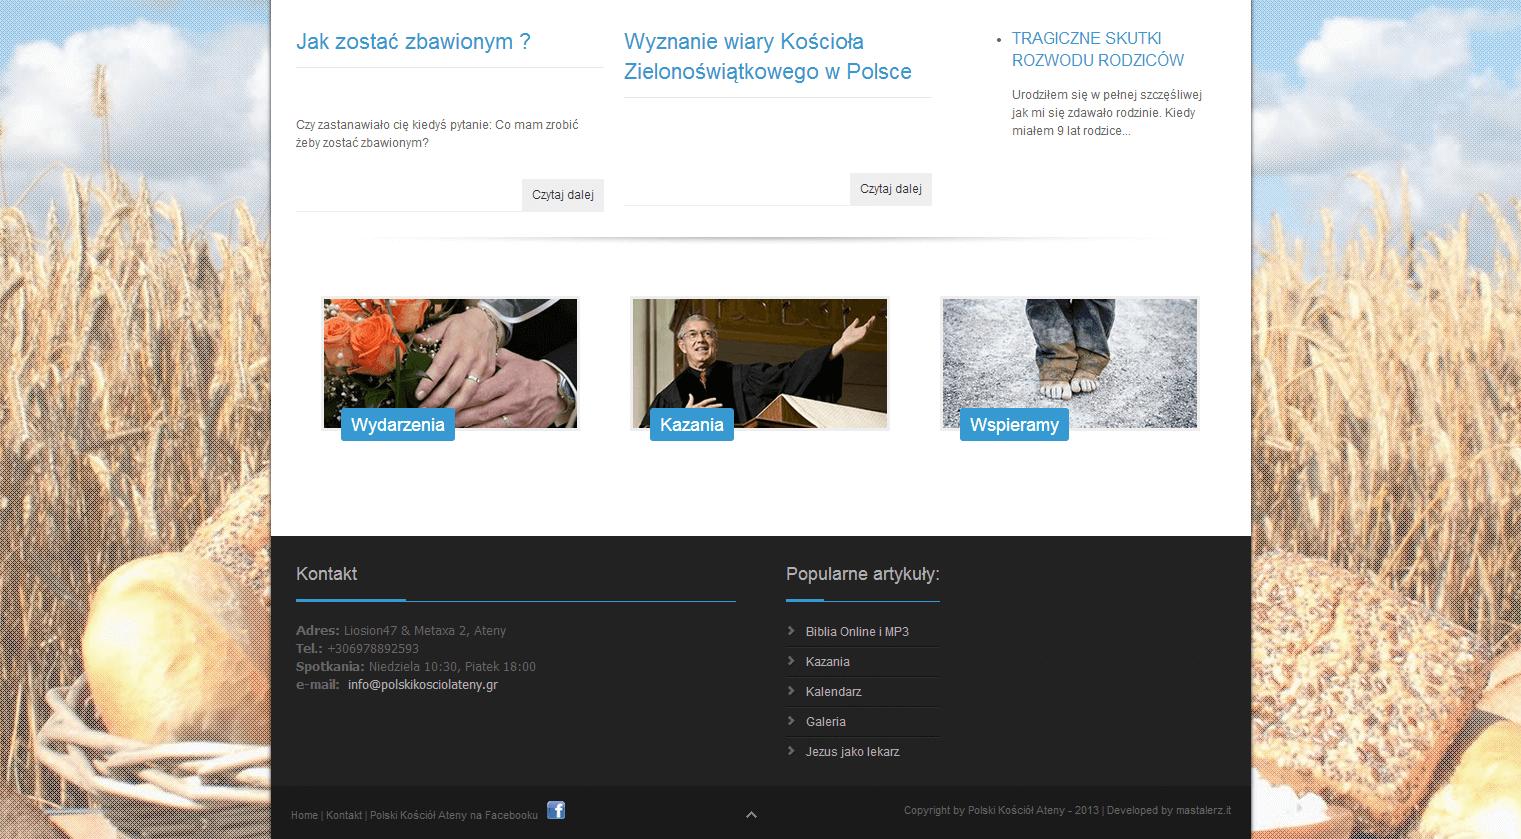 2013-05 – Homepage for the Church – polskikosciolateny.gr